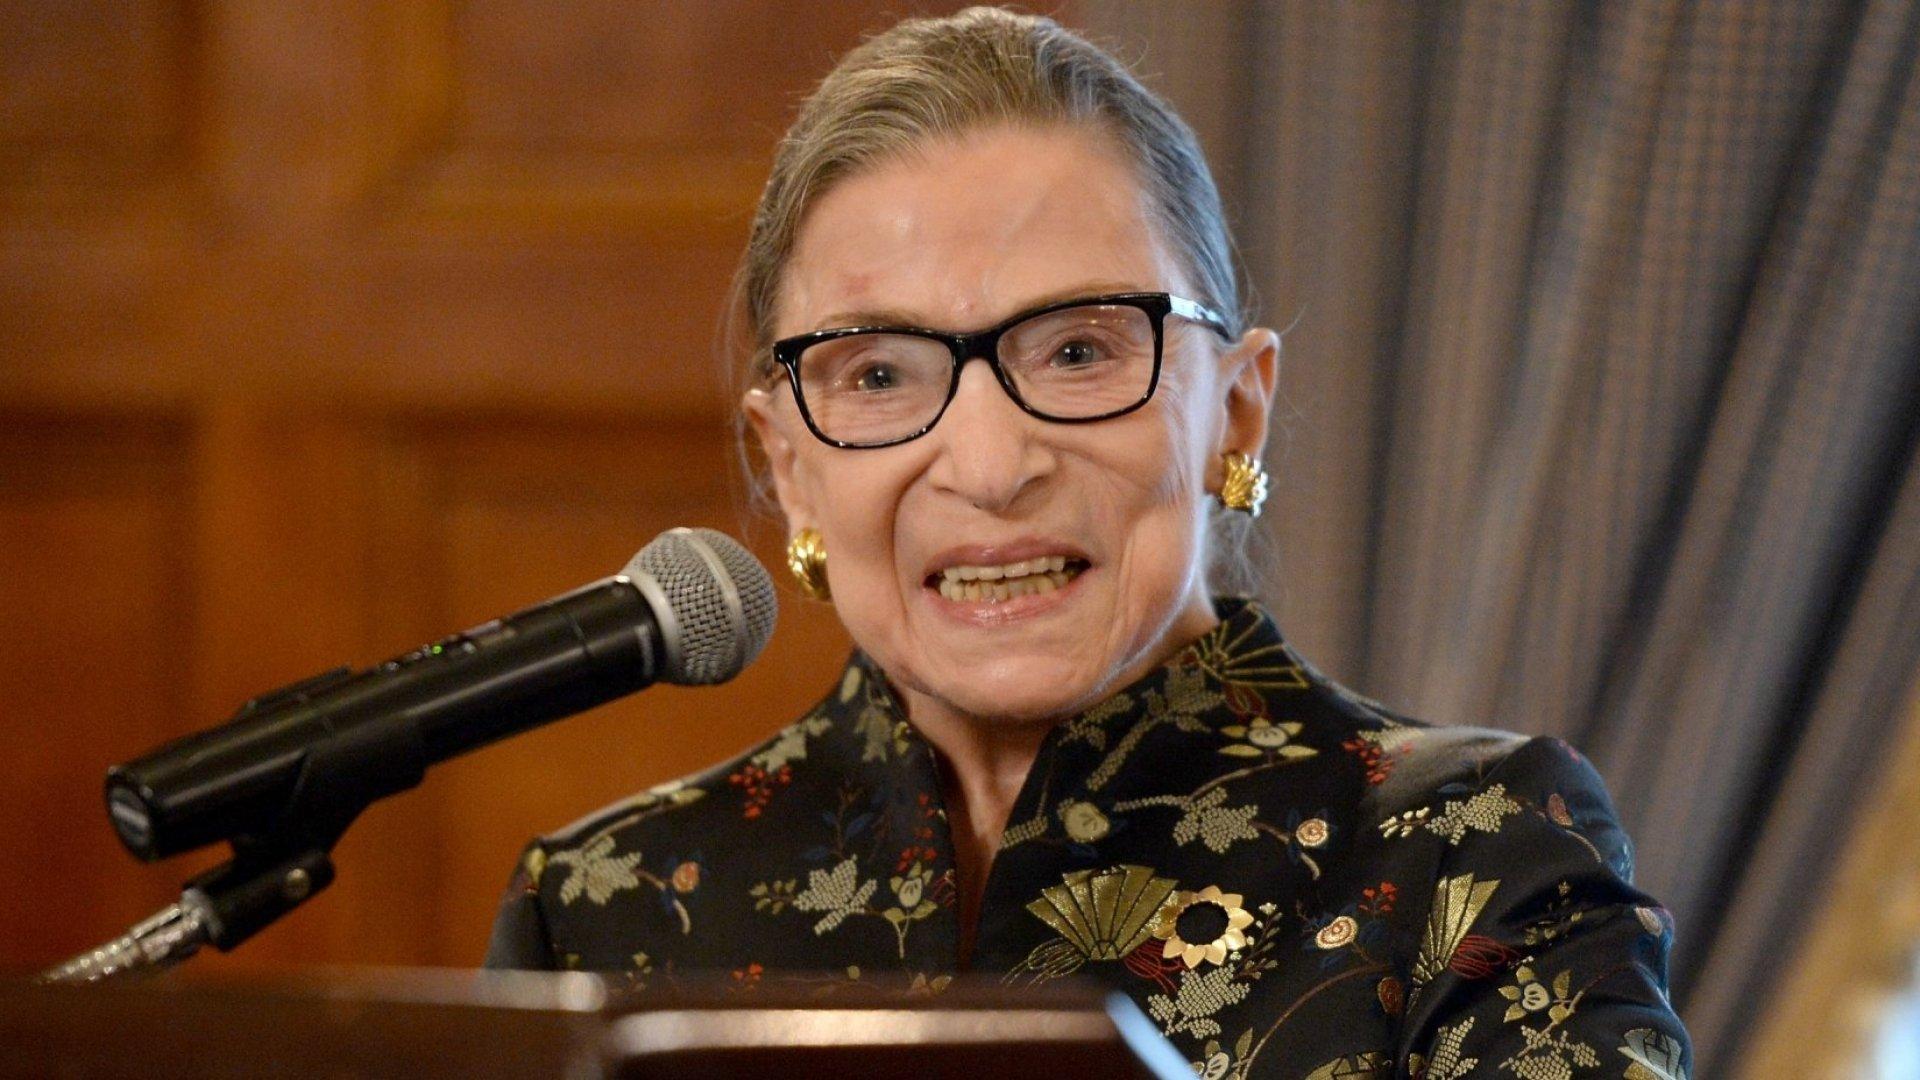 17 Powerfully Inspiring Quotes From Ruth Bader Ginsburg